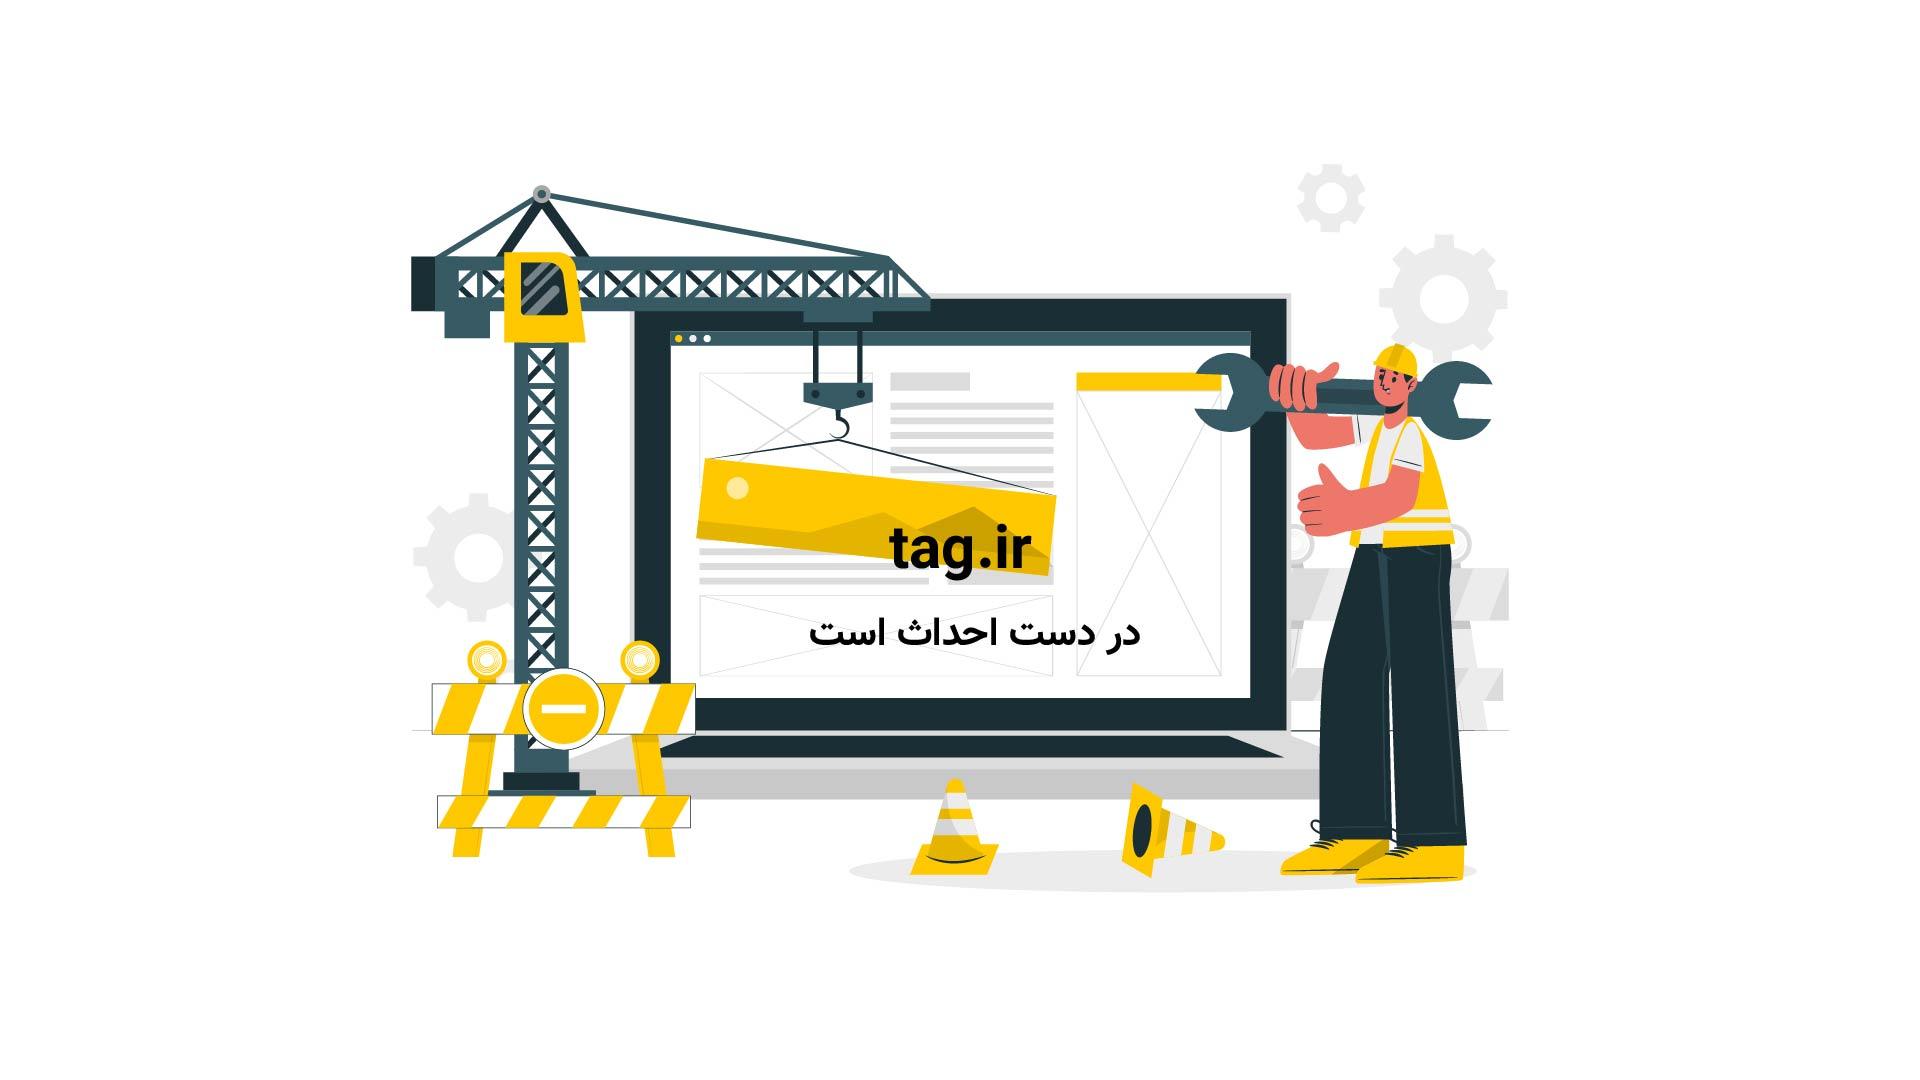 قتل عام لهستان توسط استالین شوروی | تگ